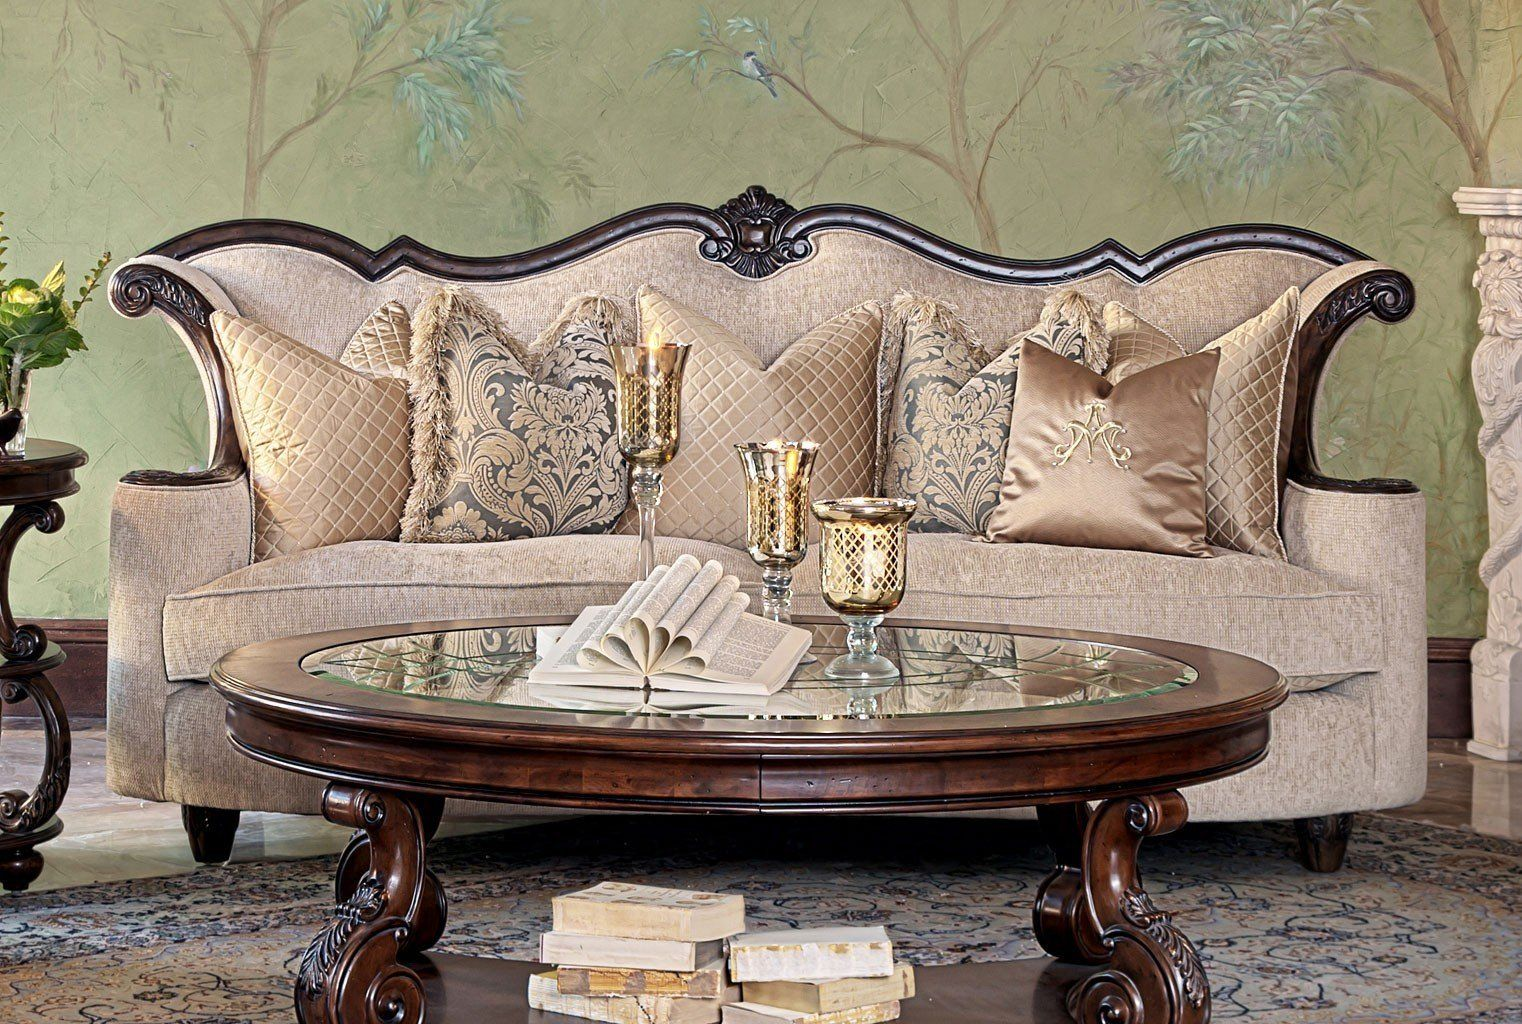 Victoria Palace Wood Trim Sofa Pale Gold Wood Furniture Design Wooden Sofa Designs Furniture Sofa Set